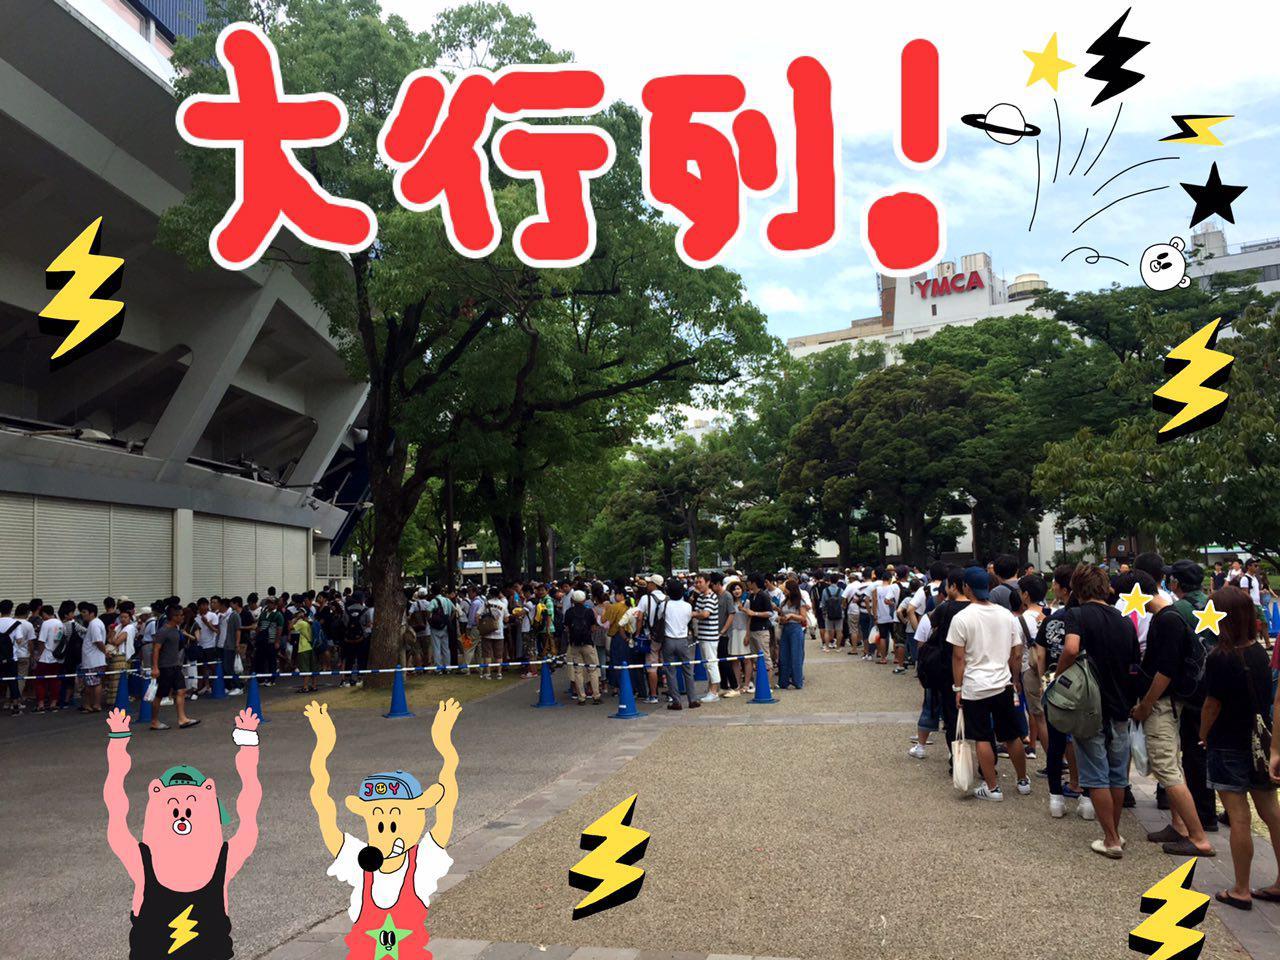 photo_2017-07-29_22-54-04.jpg